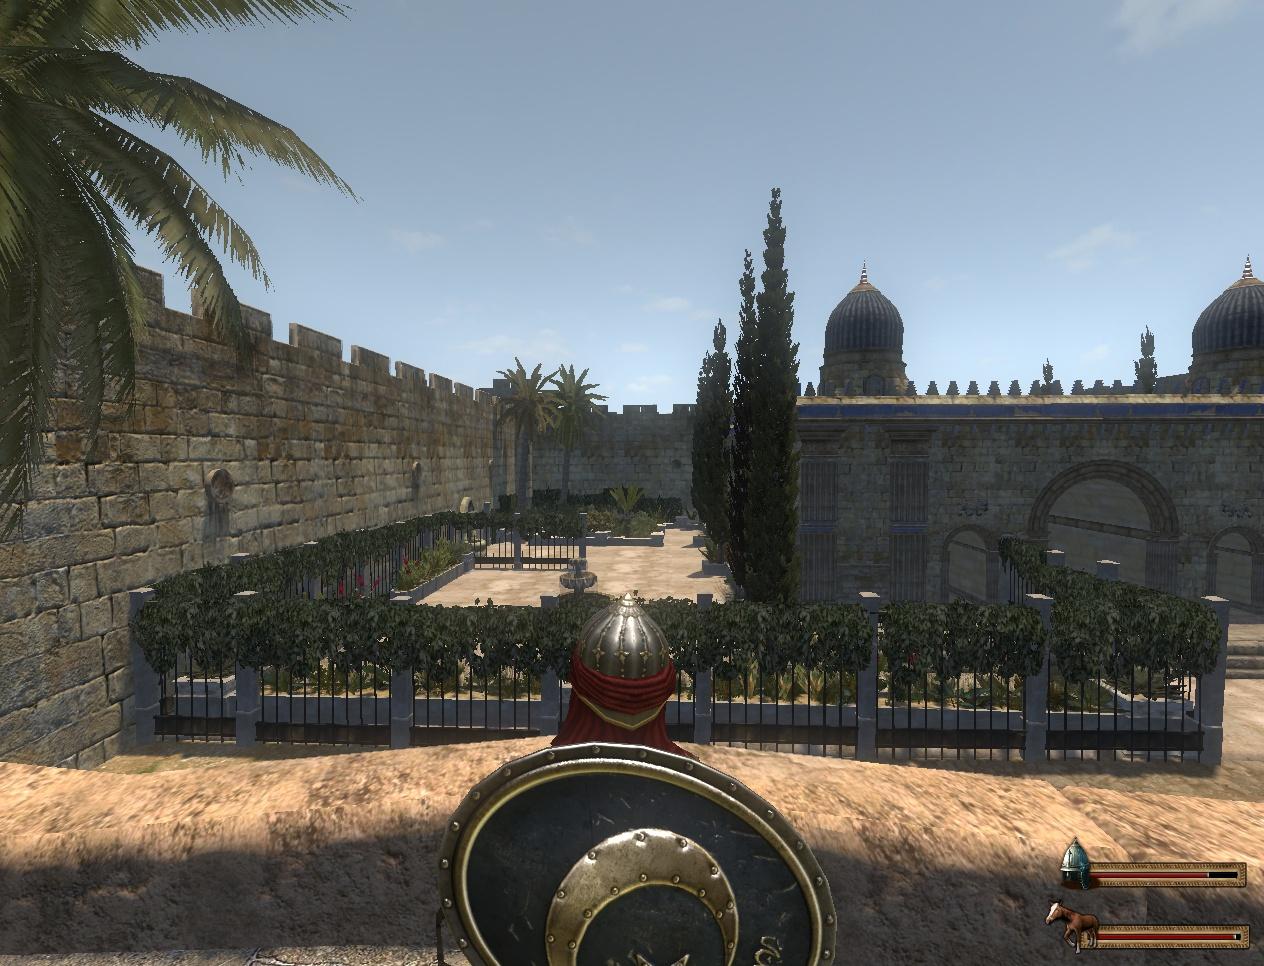 [A] Crusaders Way to Expiation (CANCELADO) - Página 3 D85b0d97814c